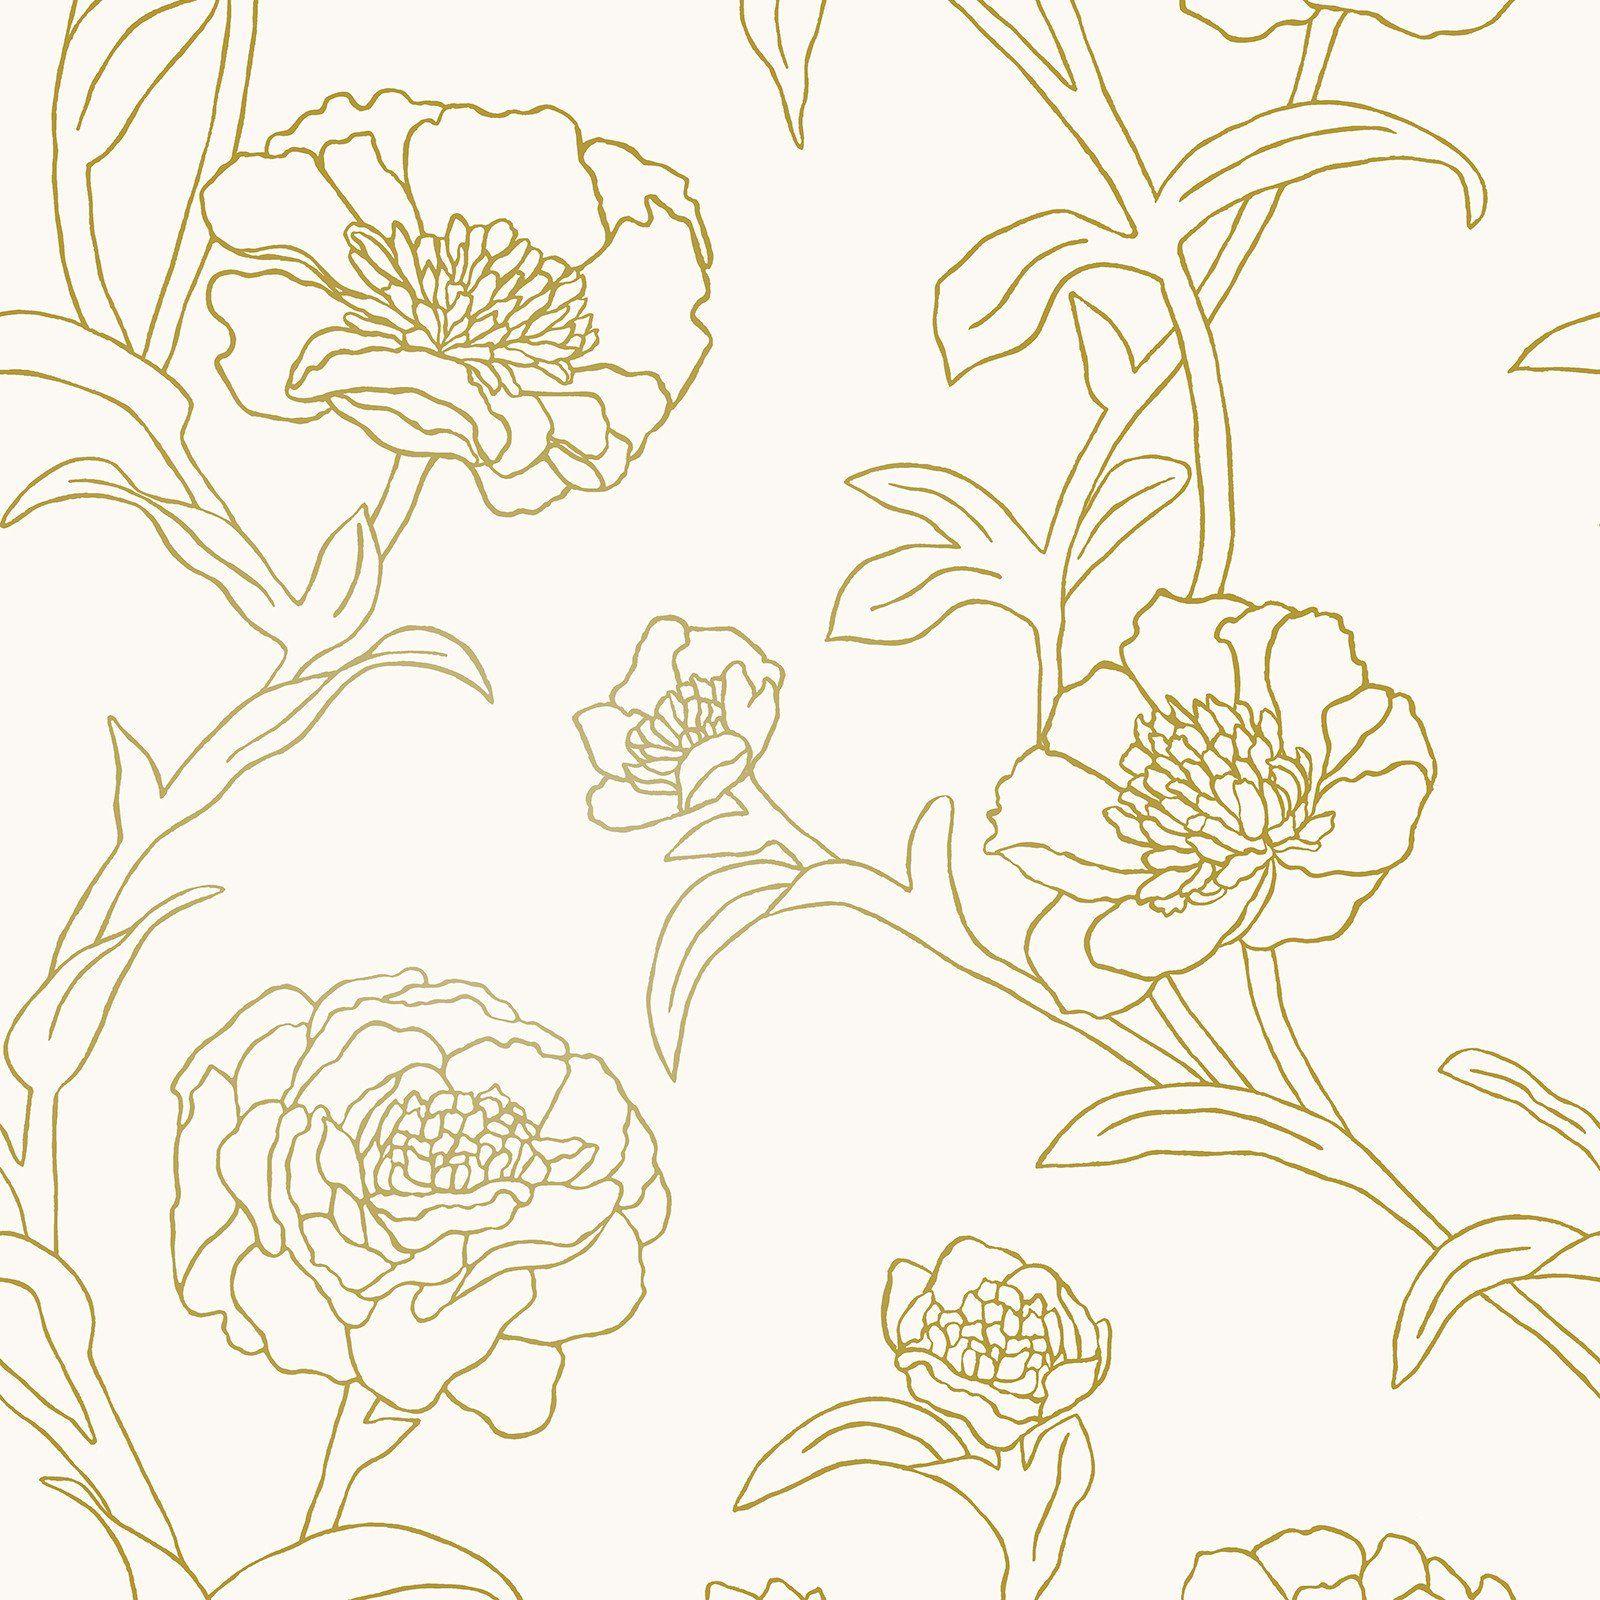 Peonies Self Adhesive Wallpaper in Gold Leaf design by Tempaper